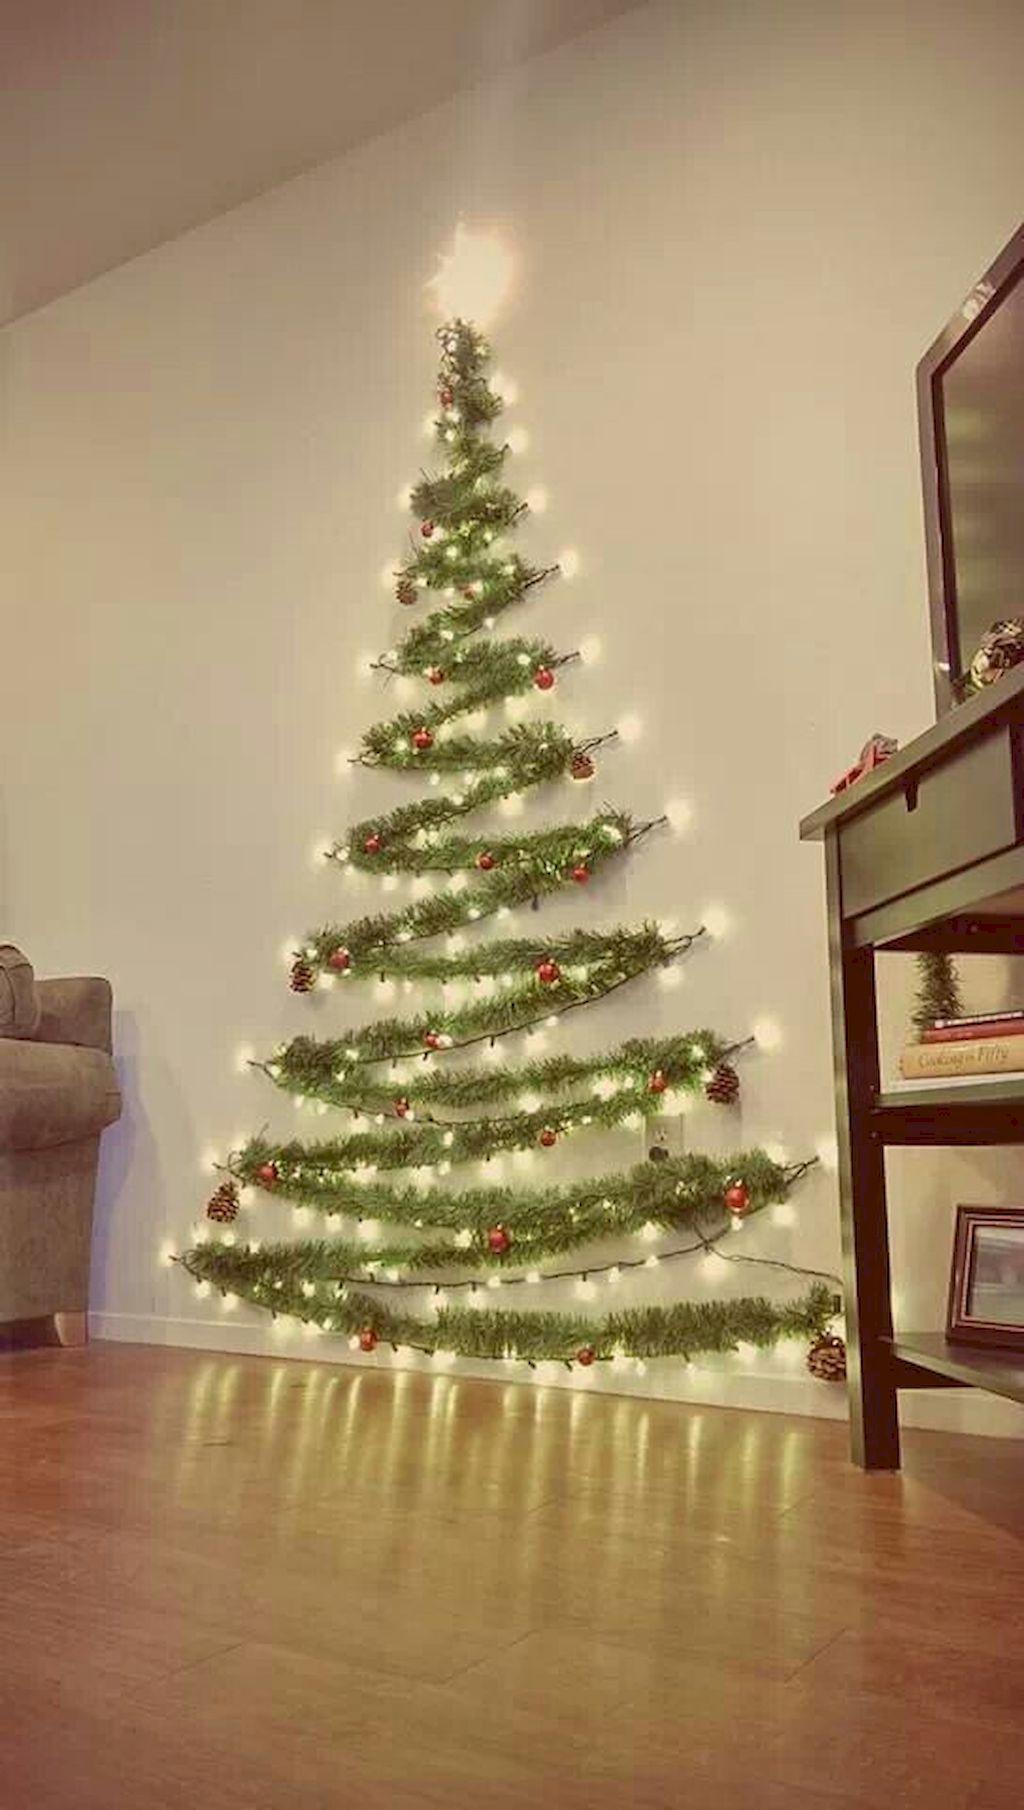 40 Apartment Decorating Christmas Lights 8 Hacer Arbol De Navidad Arbol De Navidad Pared Arbol De Navidad Original